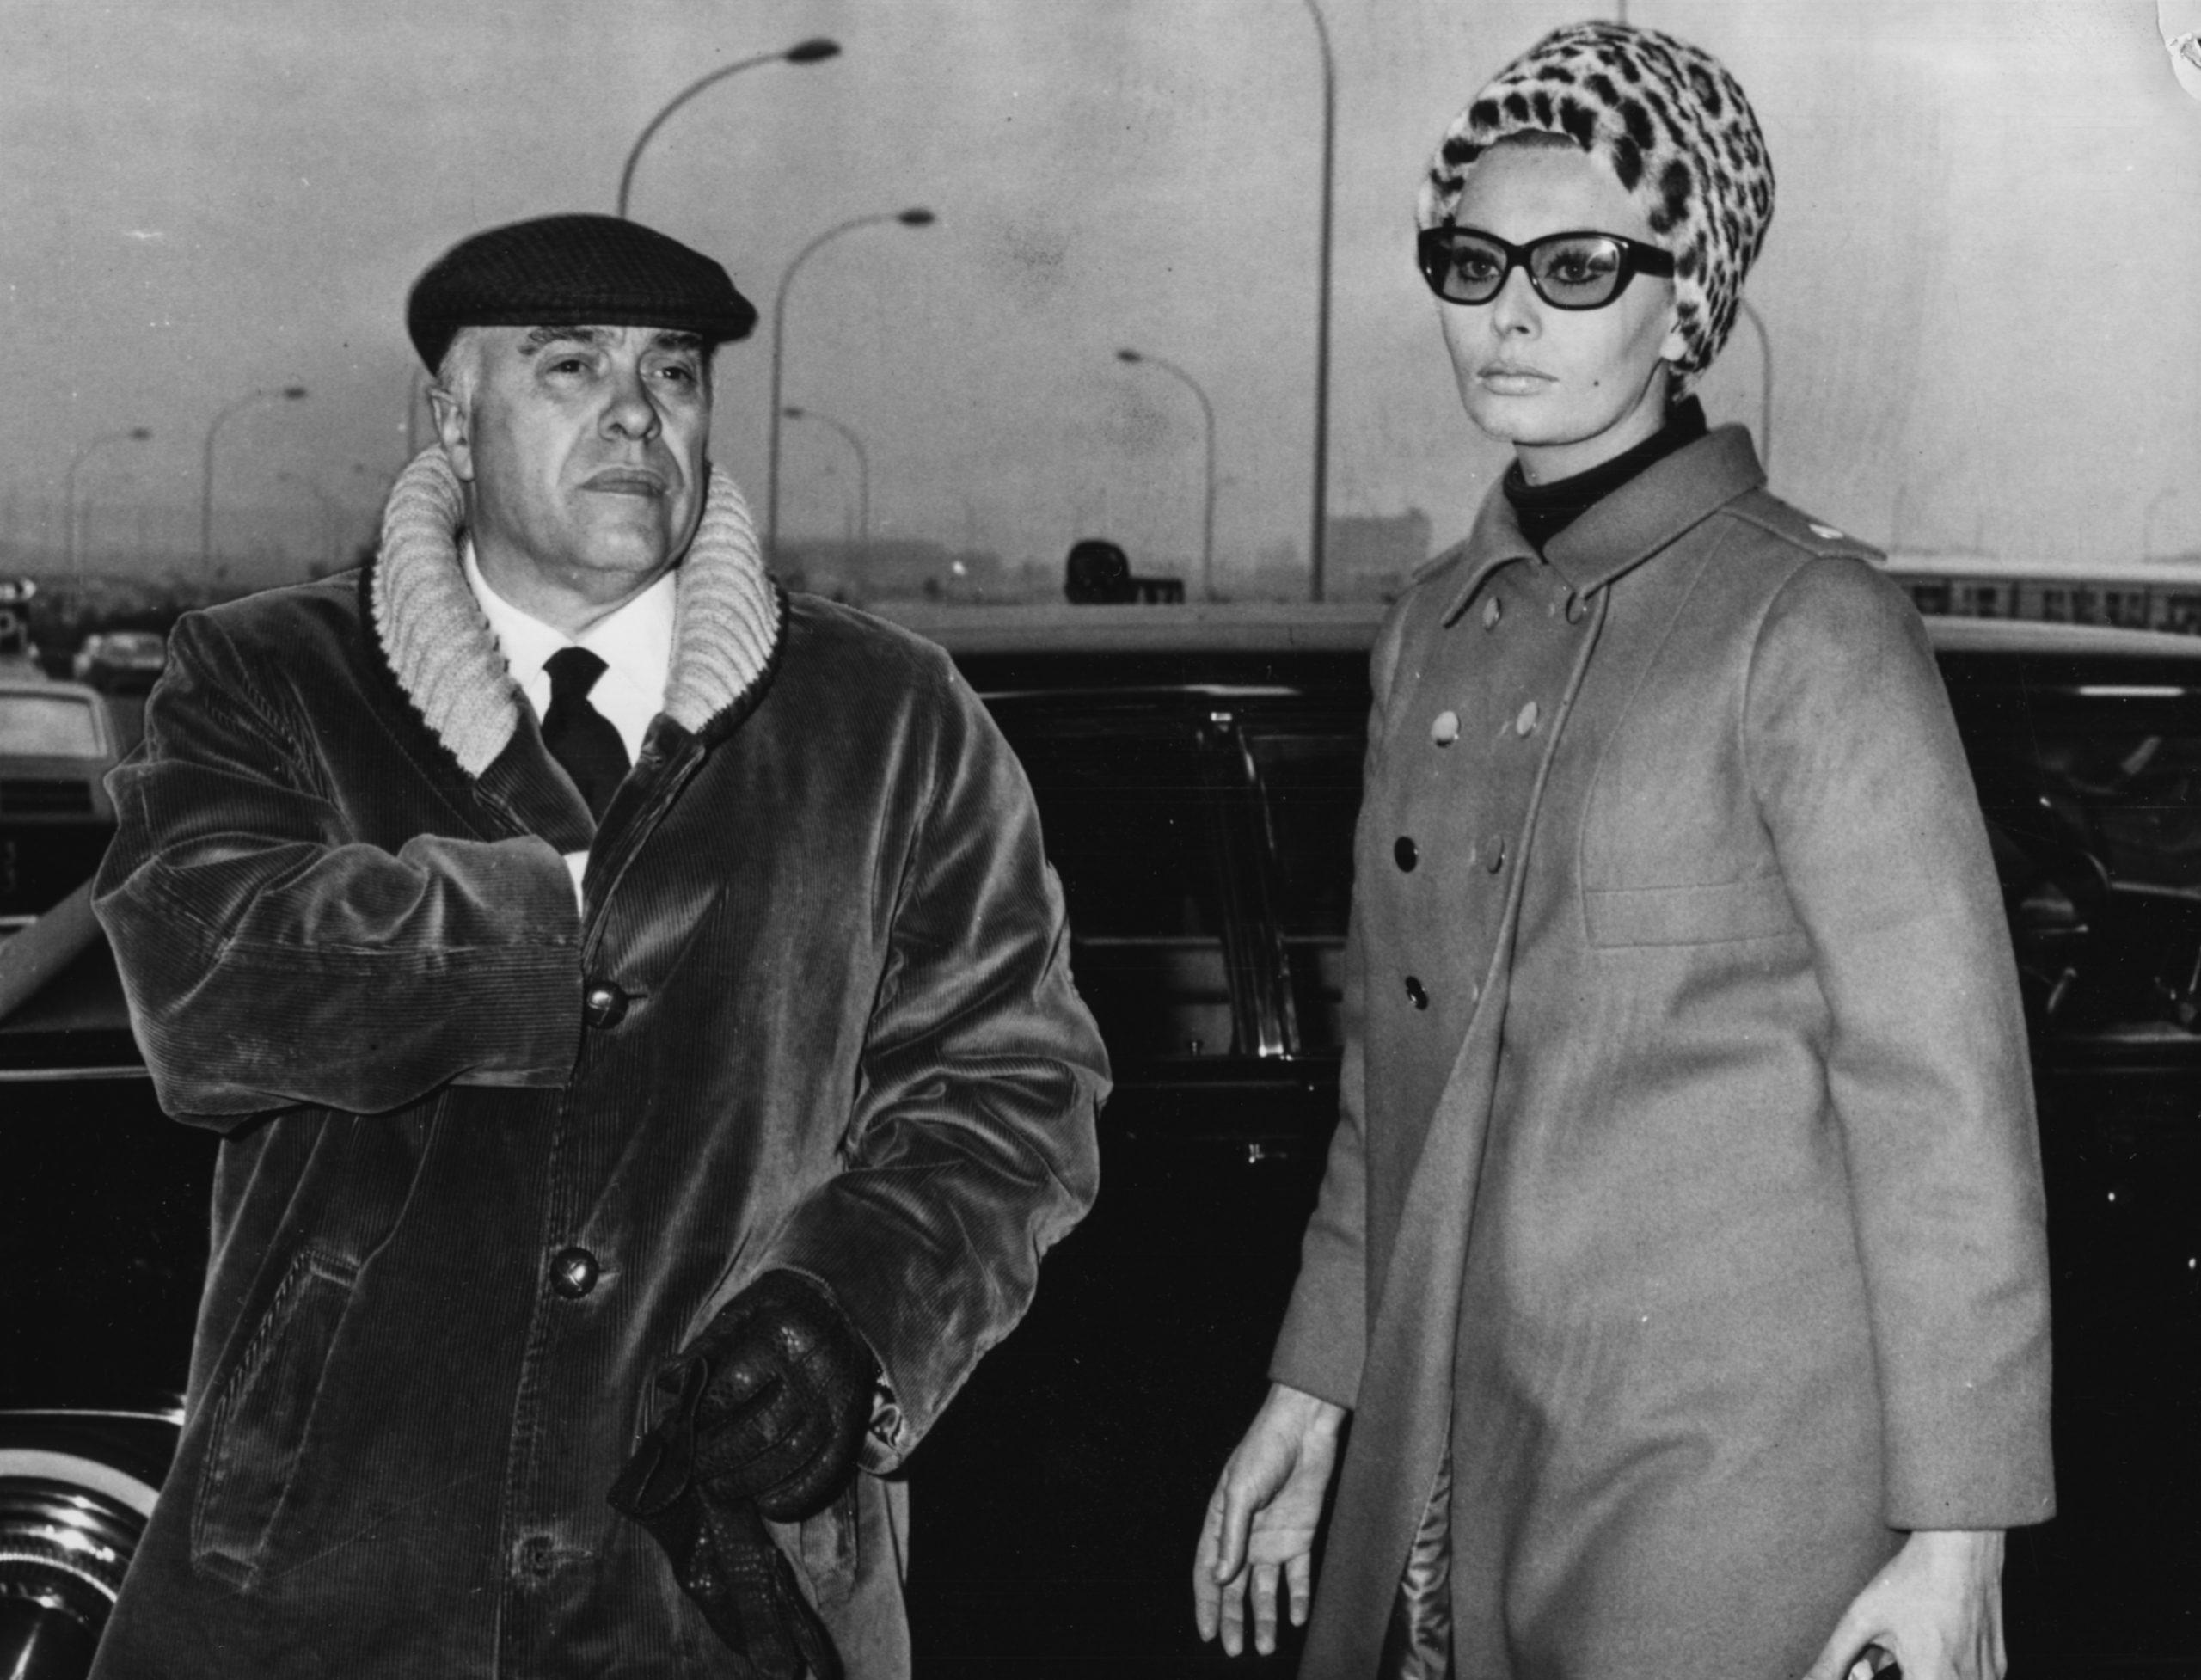 Sofia Loren y Carlo Ponti en 1967 / Foto: Getty Images